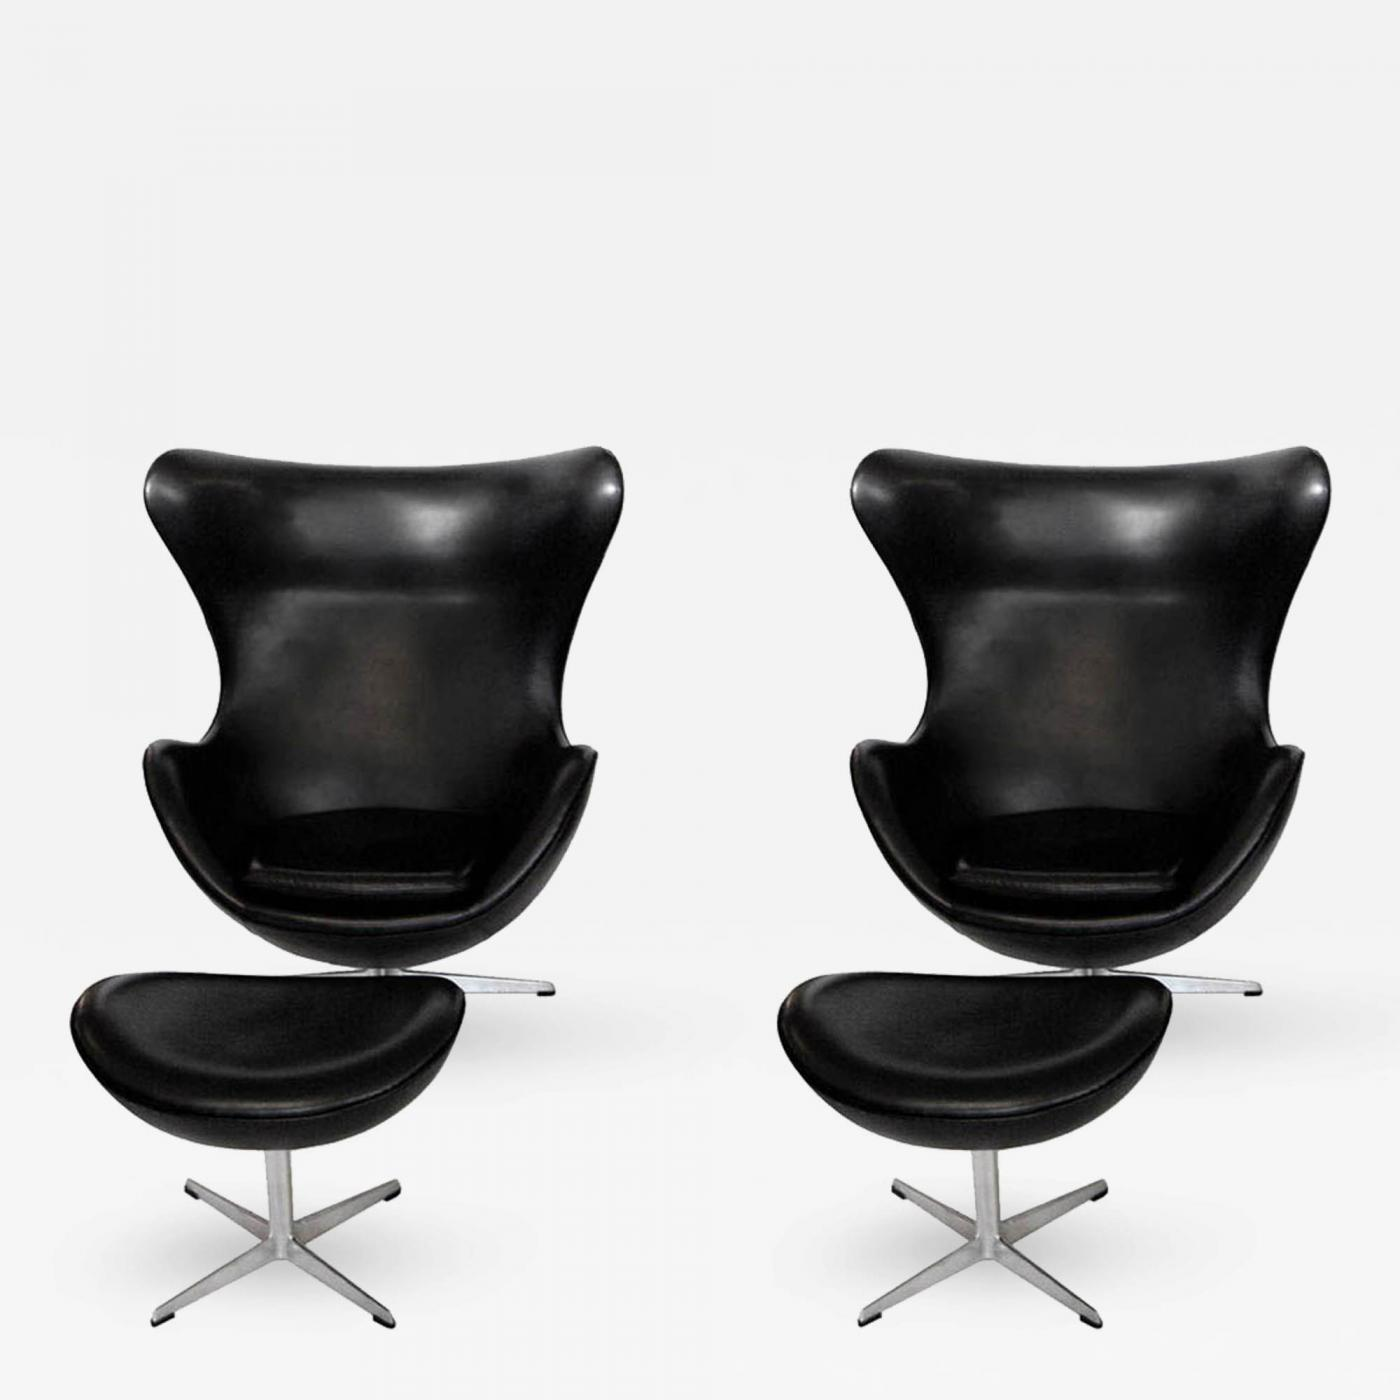 Arne Jacobsen Early Arne Jacobsen Egg Chair W Ottoman